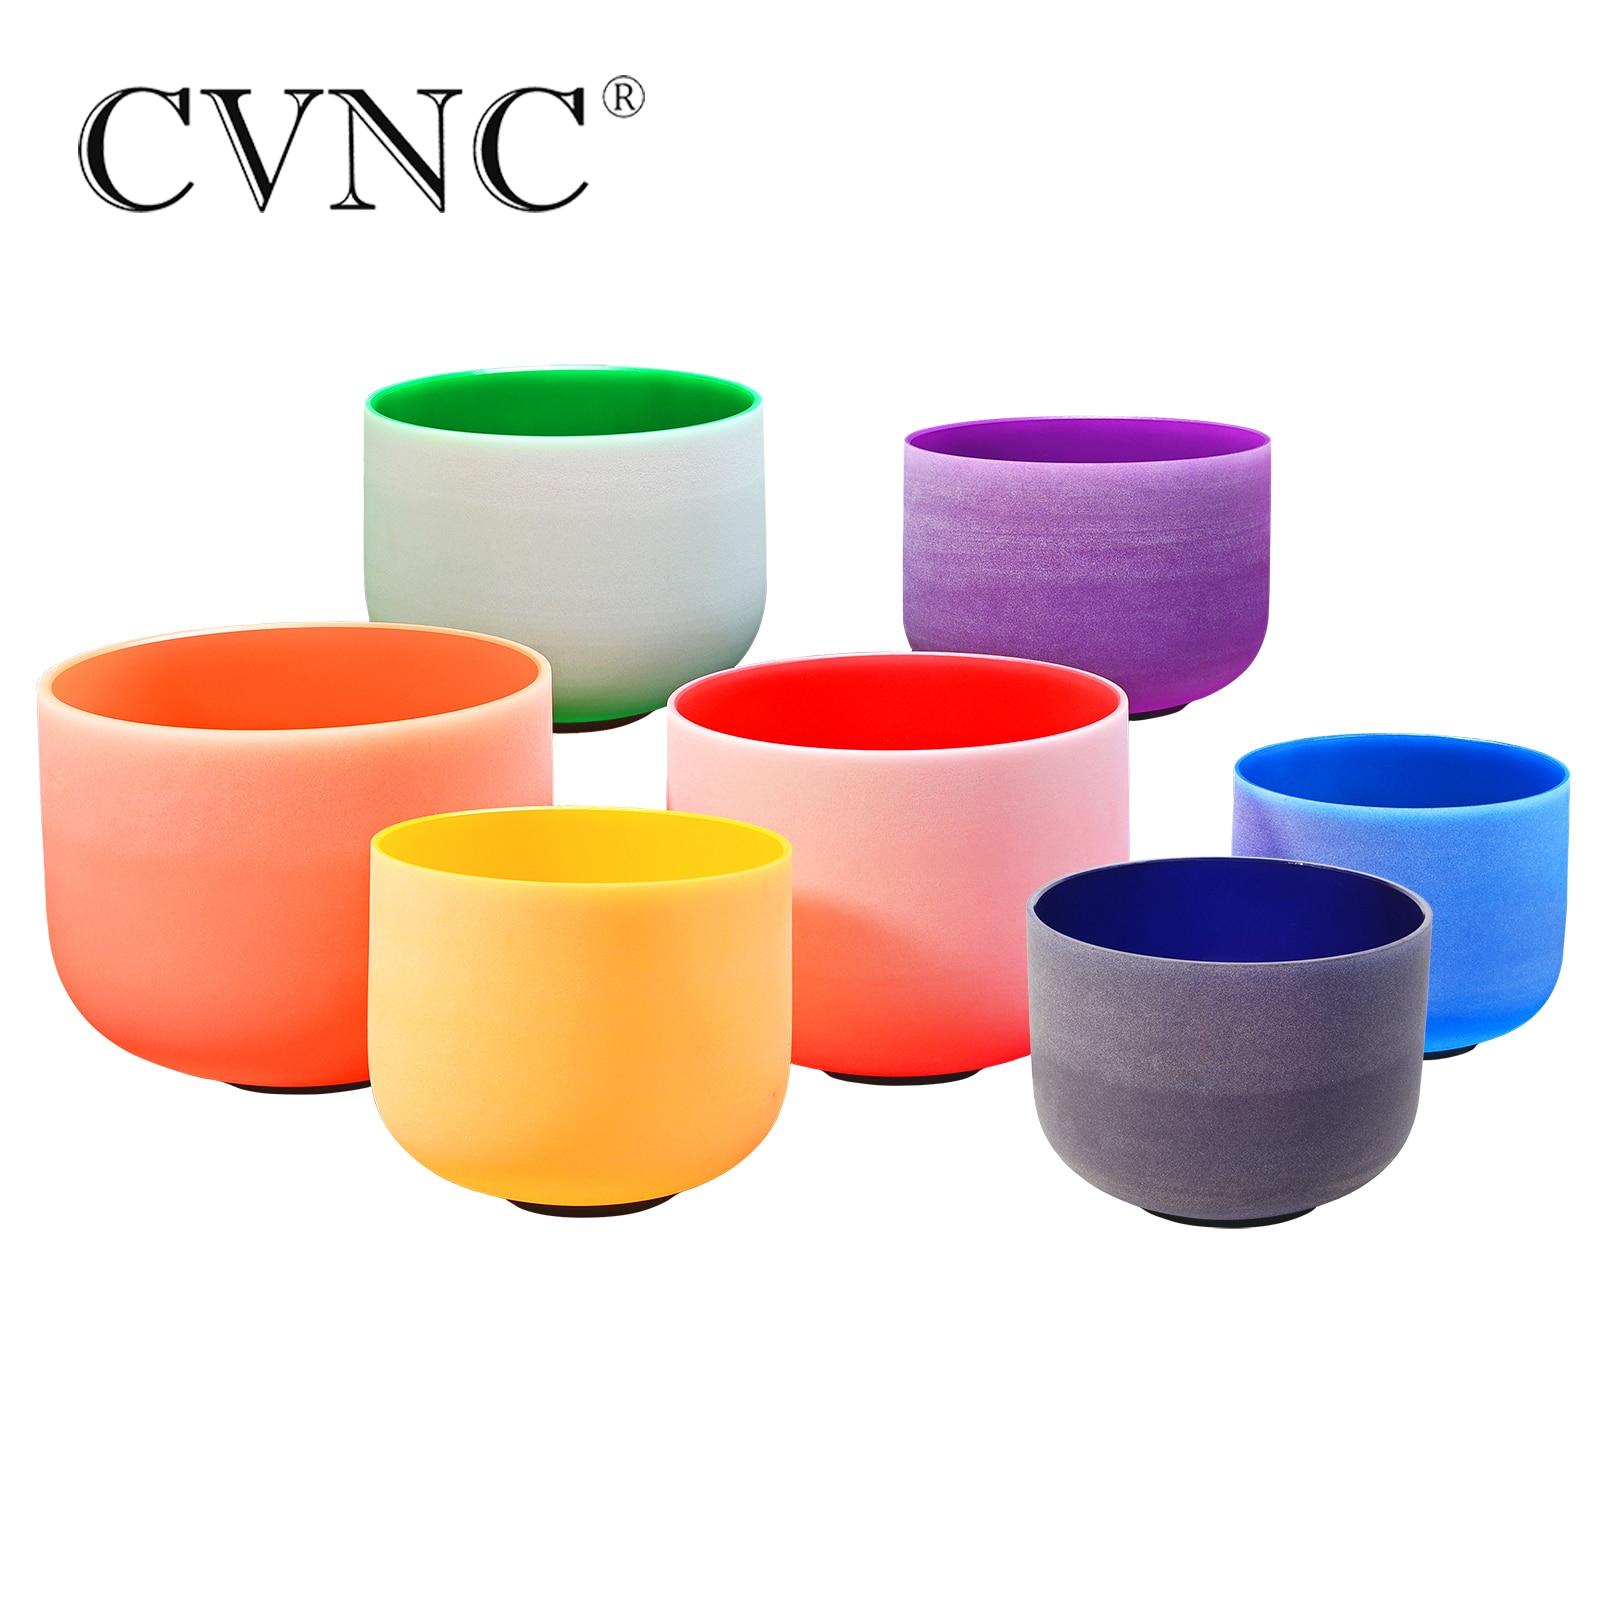 CVNC 8-10 Chakra Tuned Set of 7pcs  Note CDEFGAB Colored Frosted Quartz Crystal Singing Bowl